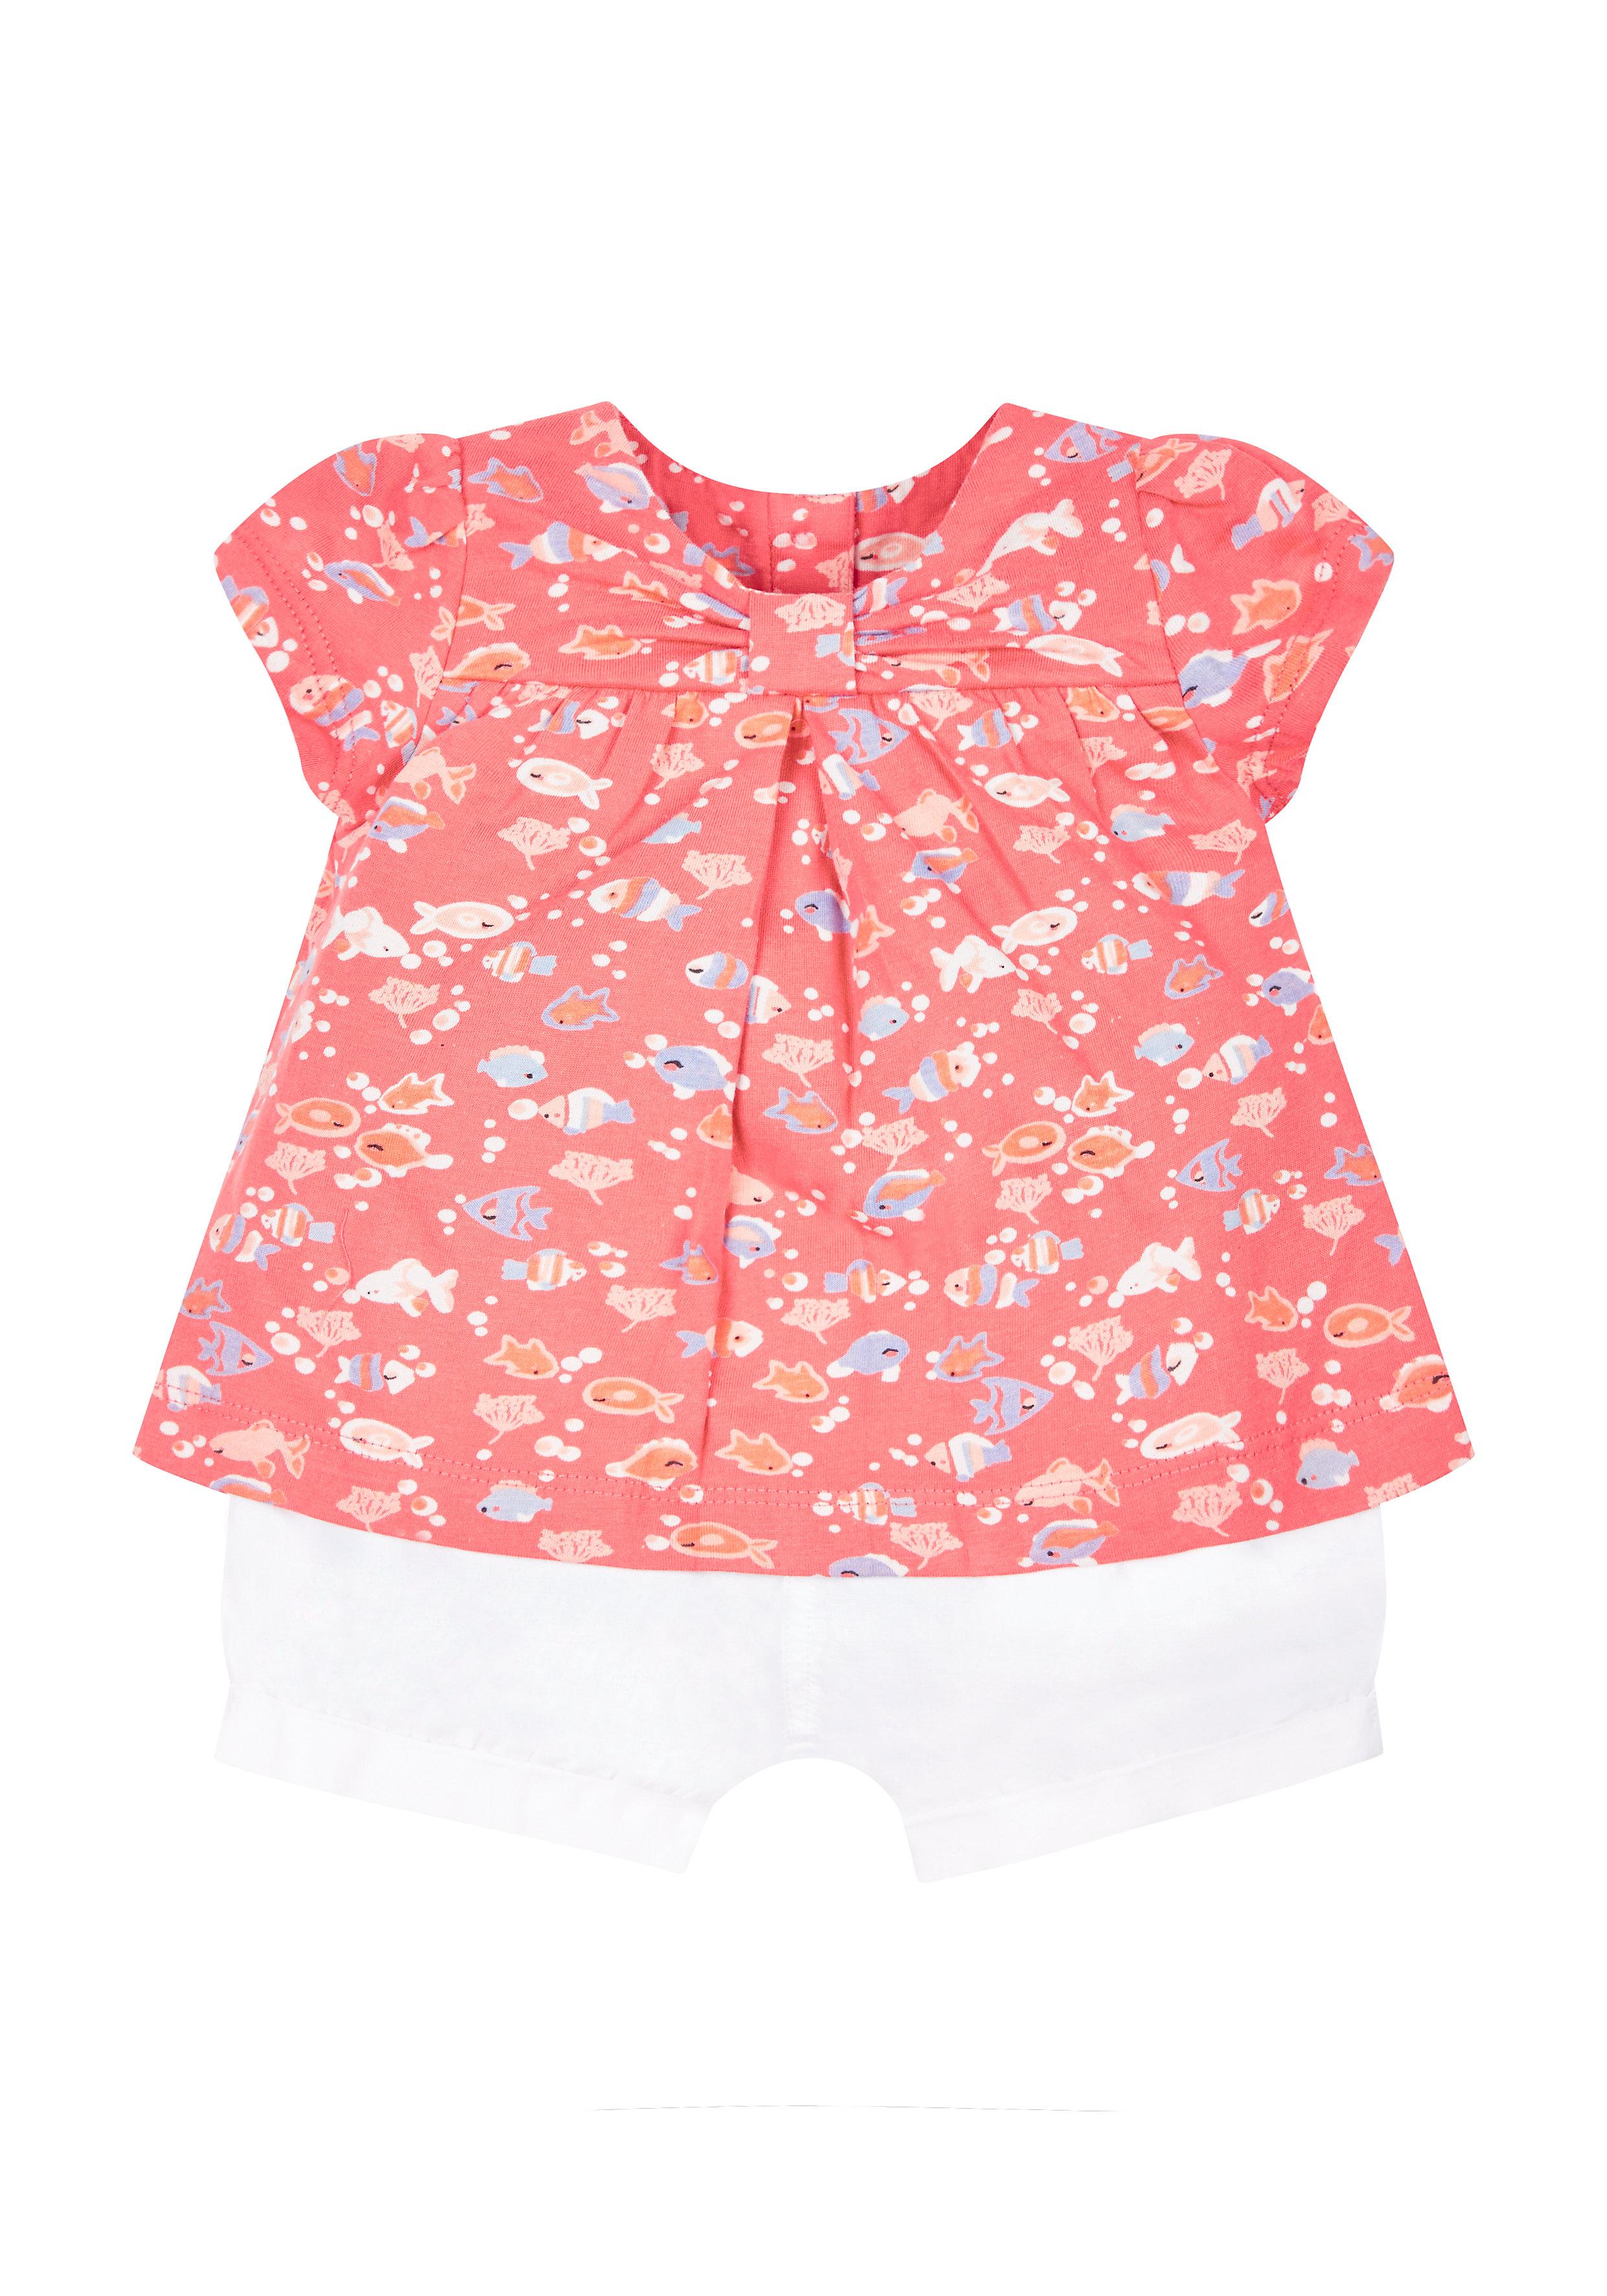 Mothercare | Girls Fish Blouse And Shorts Set - Coral